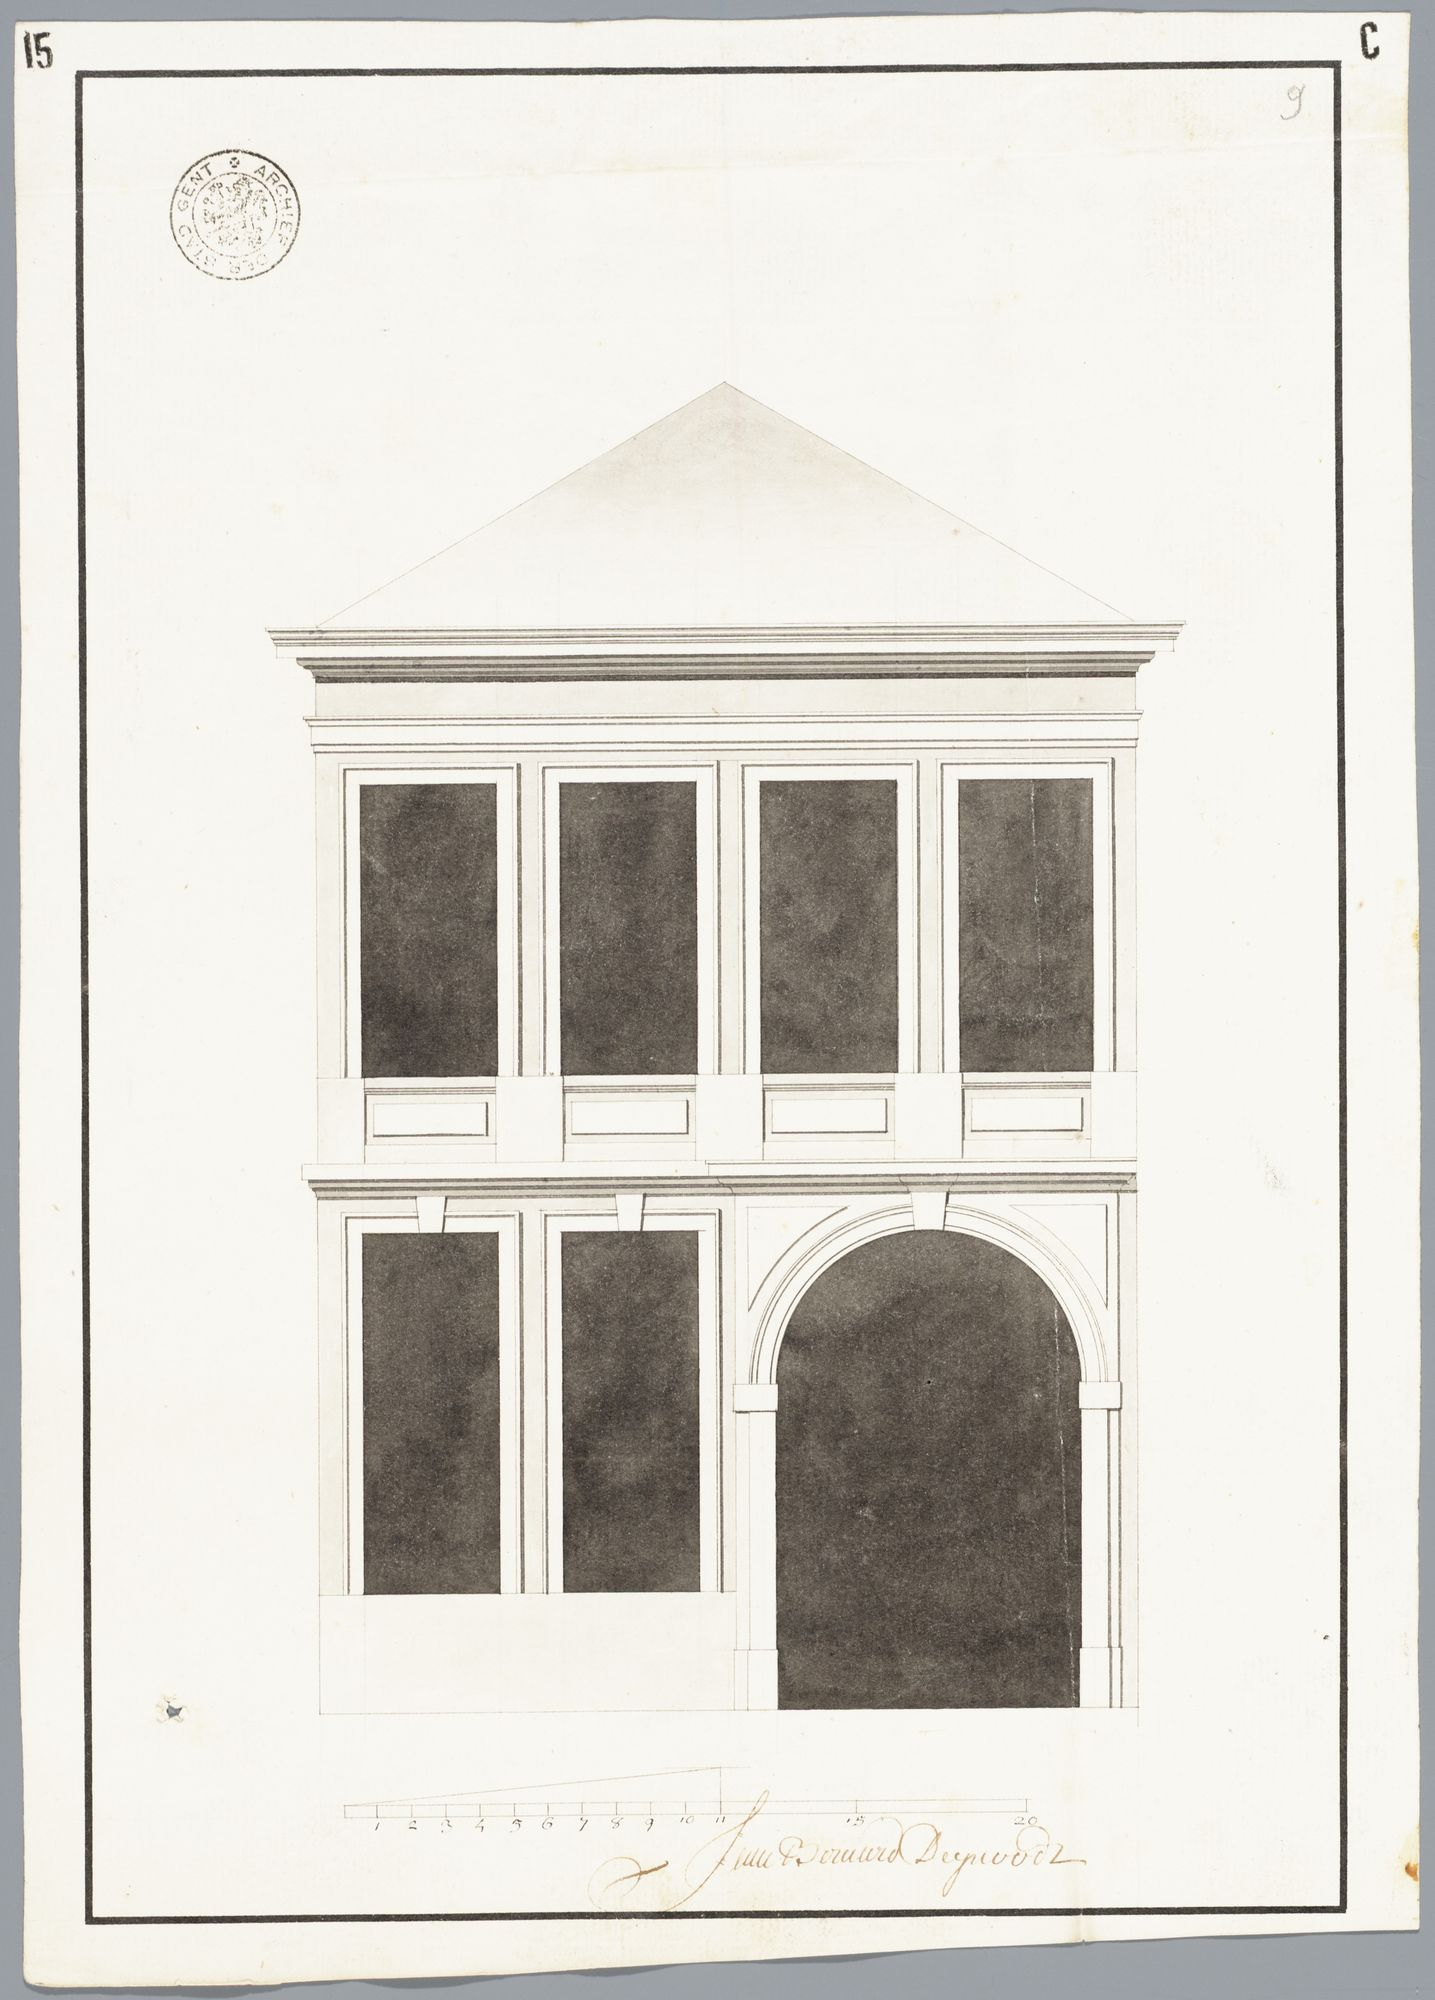 Gent: Ajuinlei, 1785: opstand voorgevel